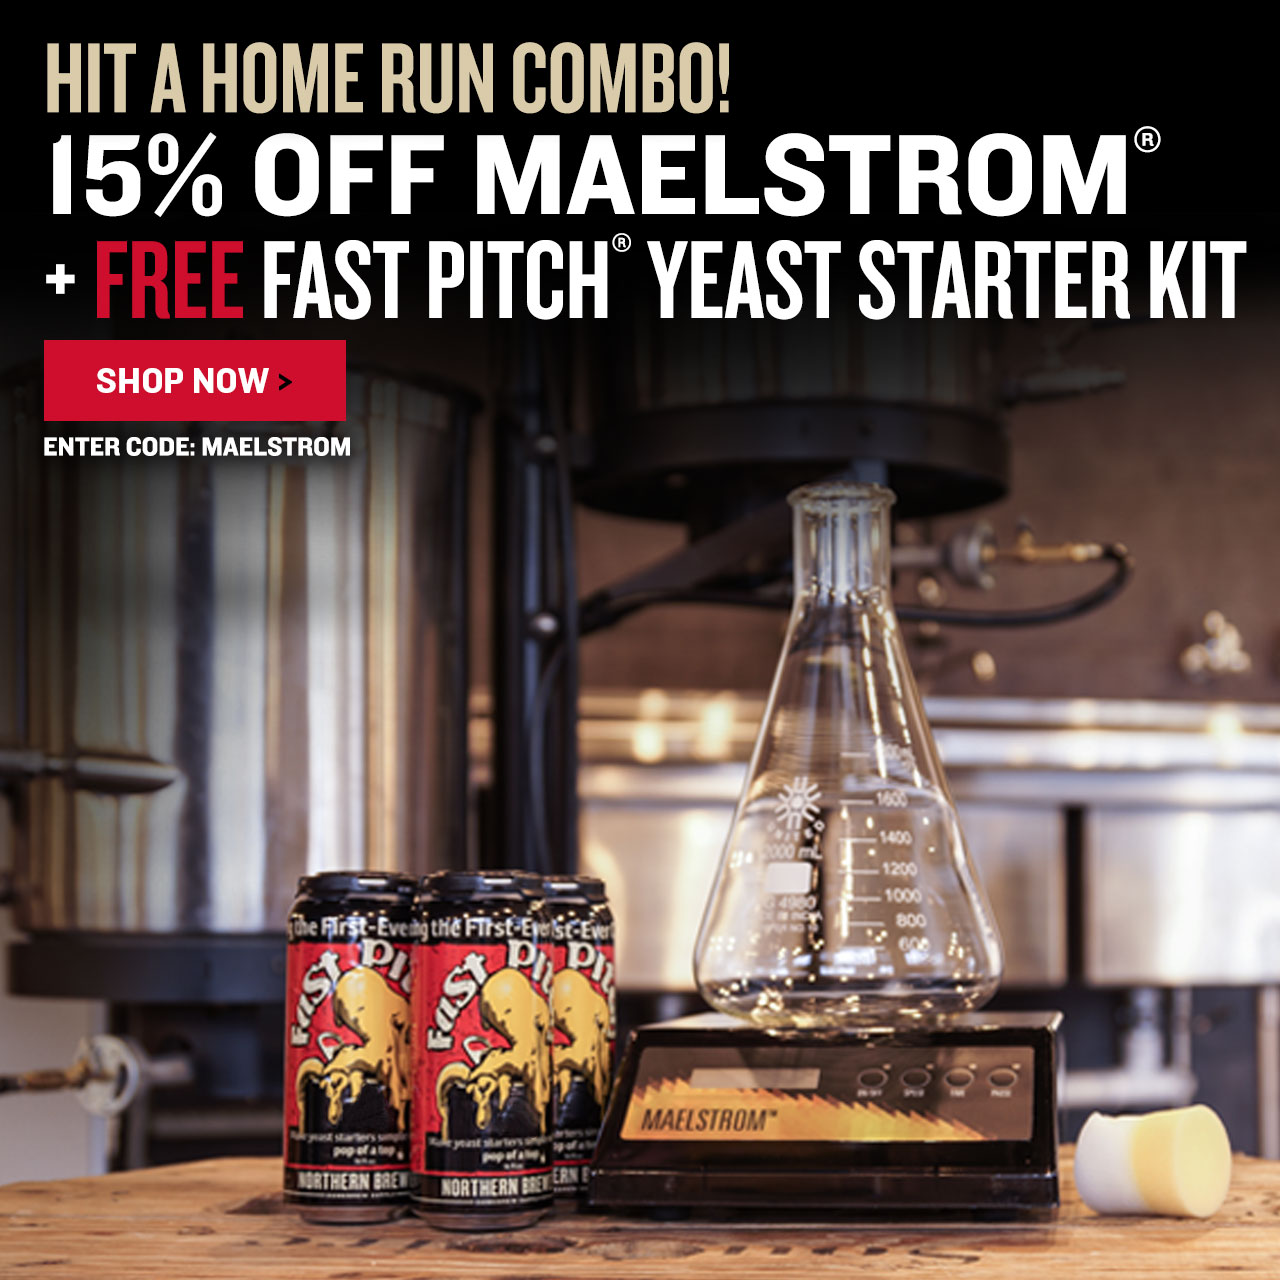 15% Off Maelstrom + Free Fast Pitch Yeast Starter Kit. Promo Code: MAELSTROM